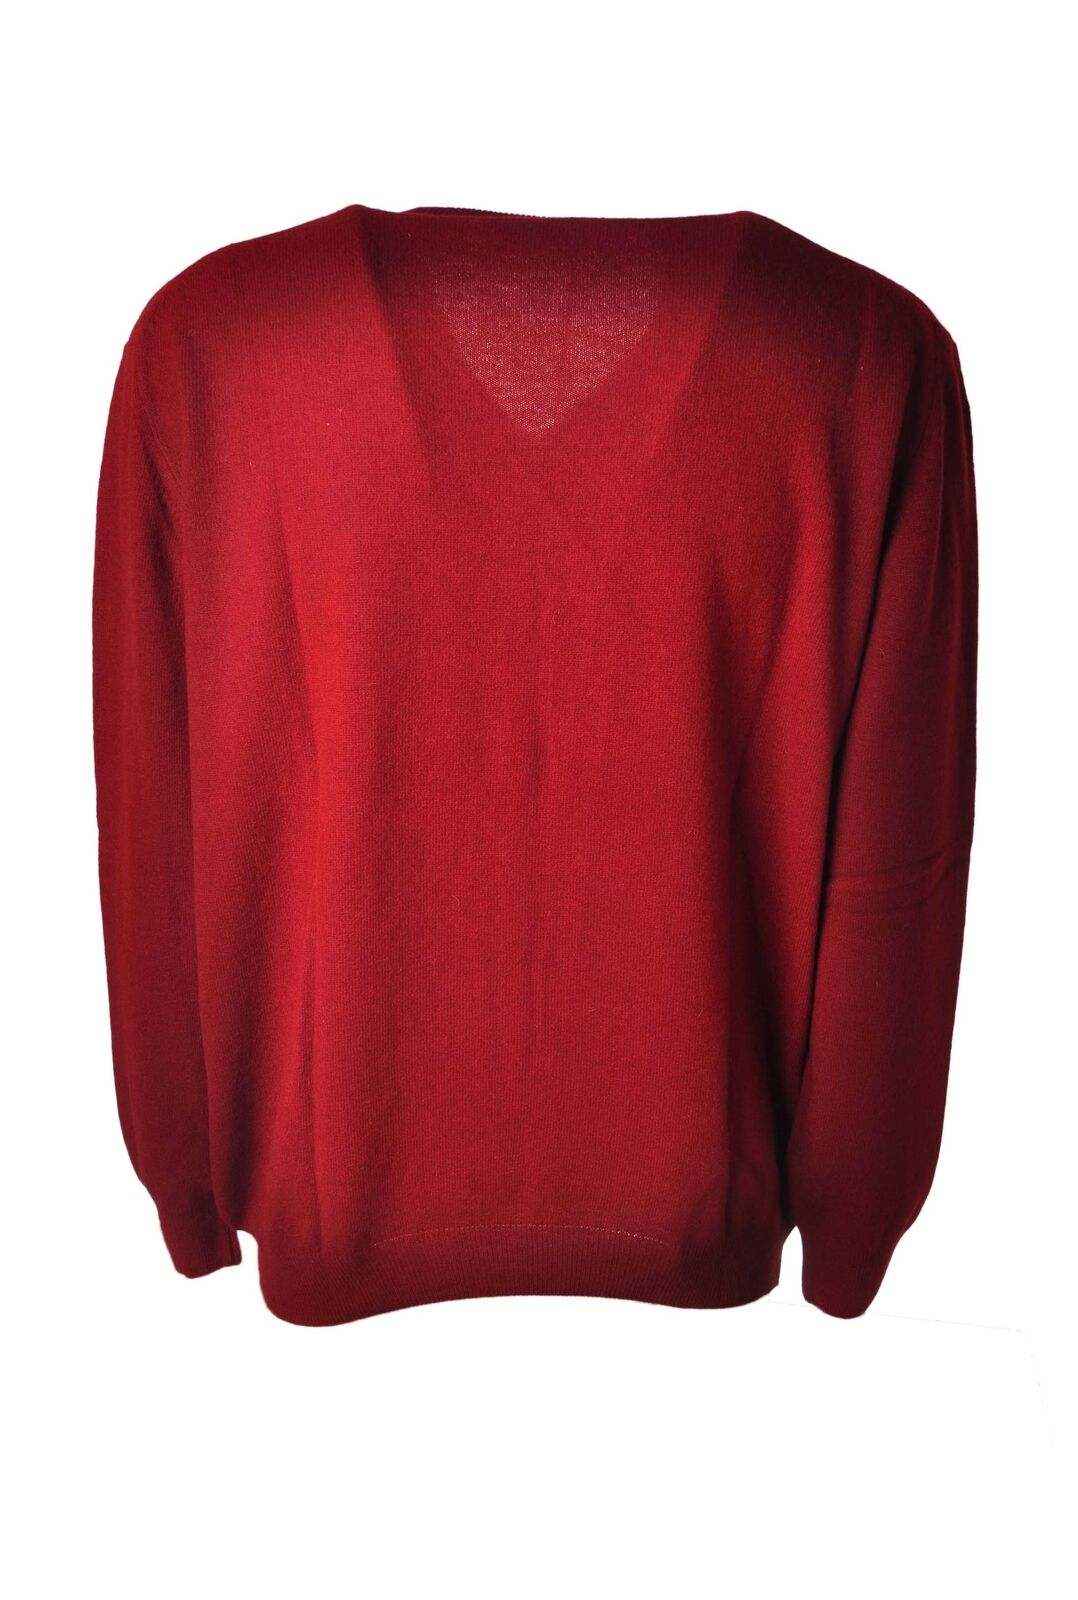 BCN  -  Pullover Pullover  - Männchen - Rot - 4531323A184751 5a78f4